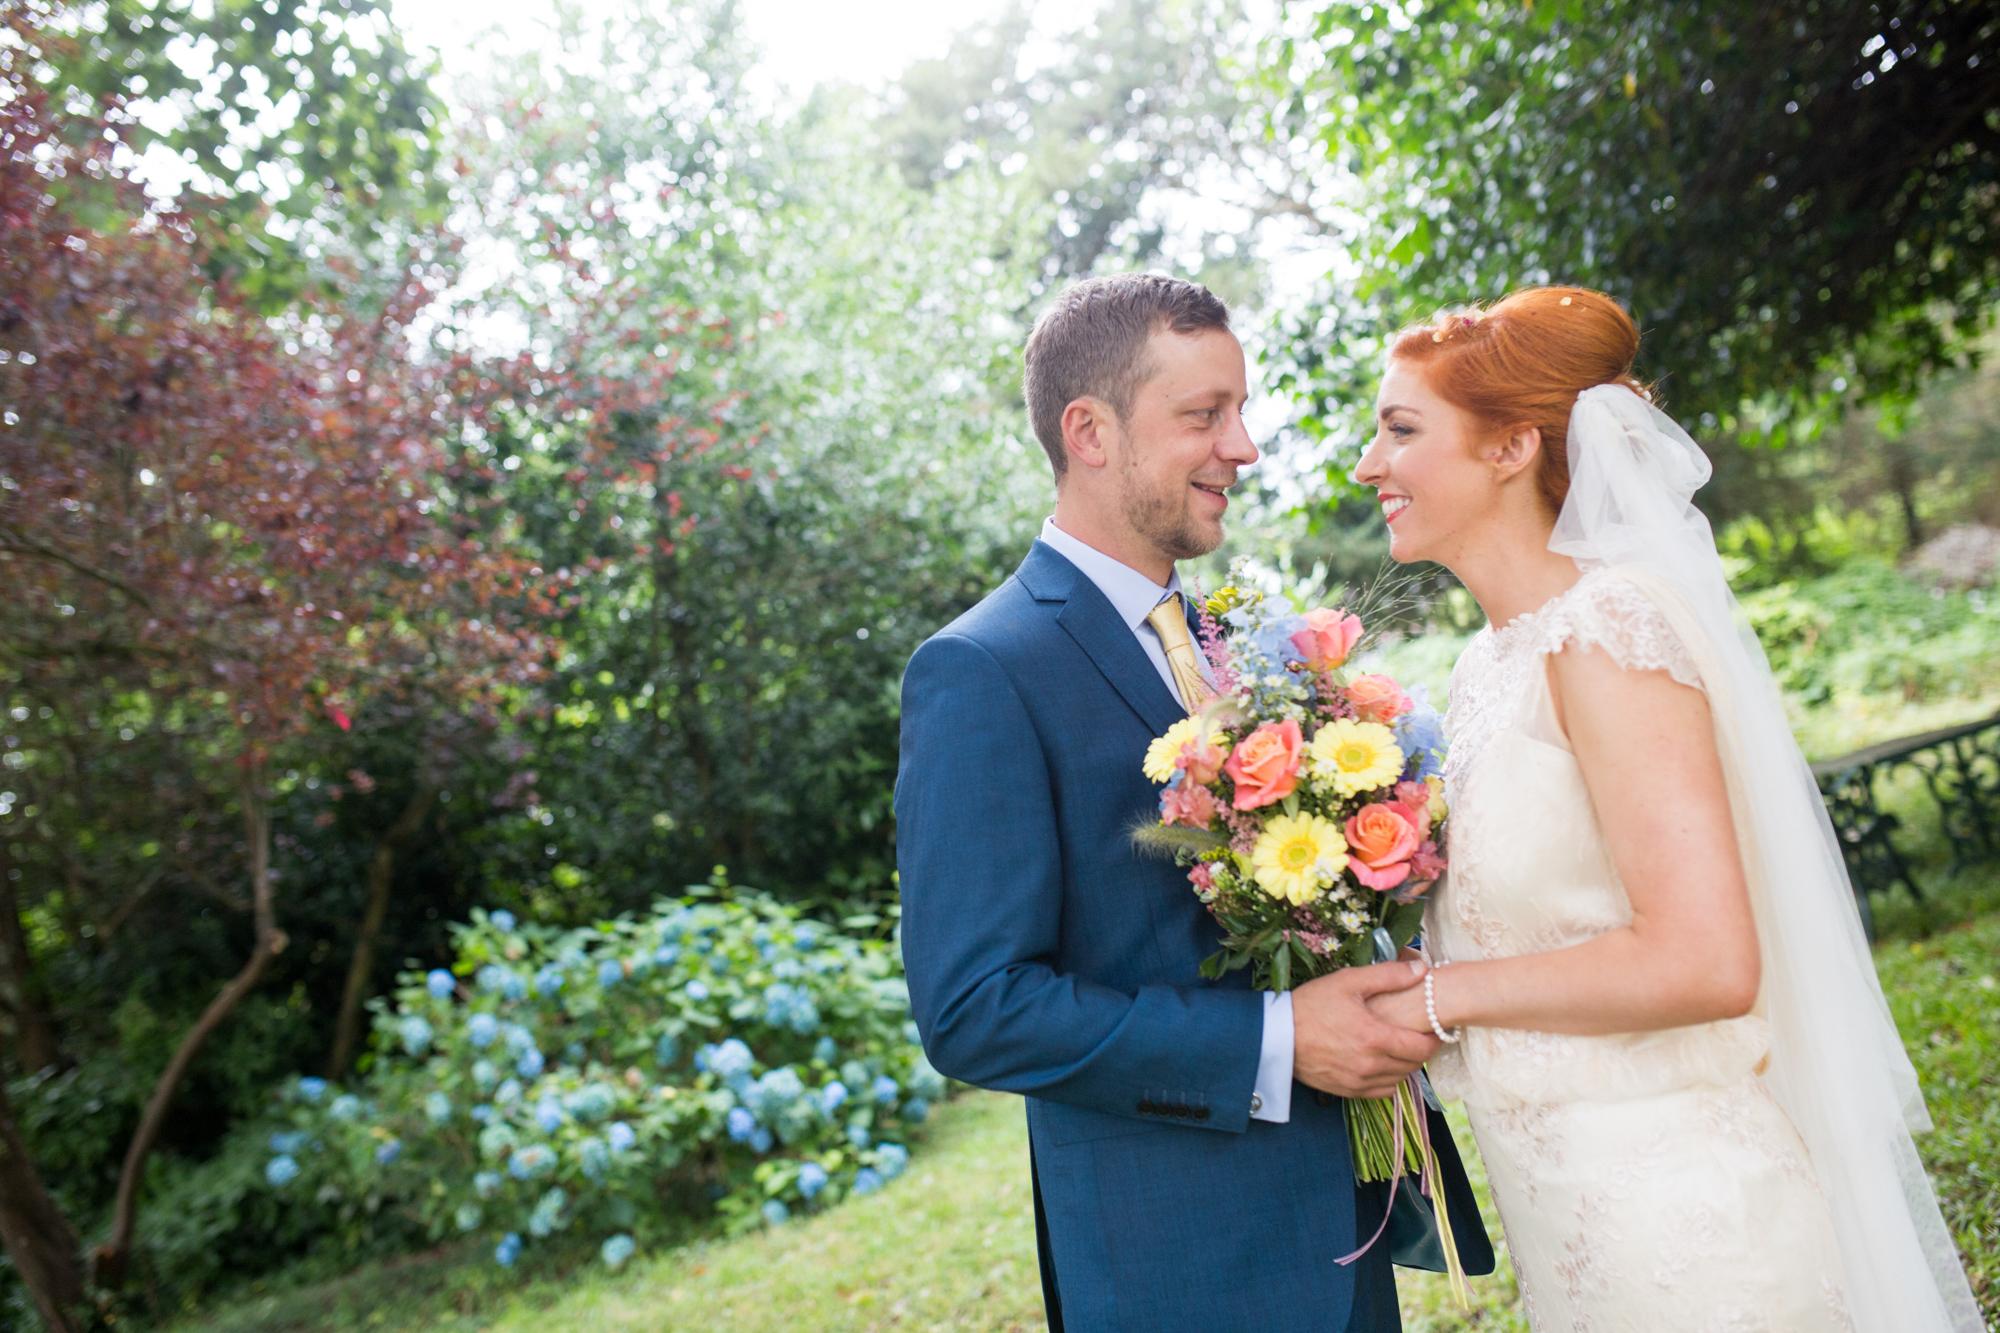 weddings at the alverton Truro by Tom Robinson photography Cornwall wedding photographer